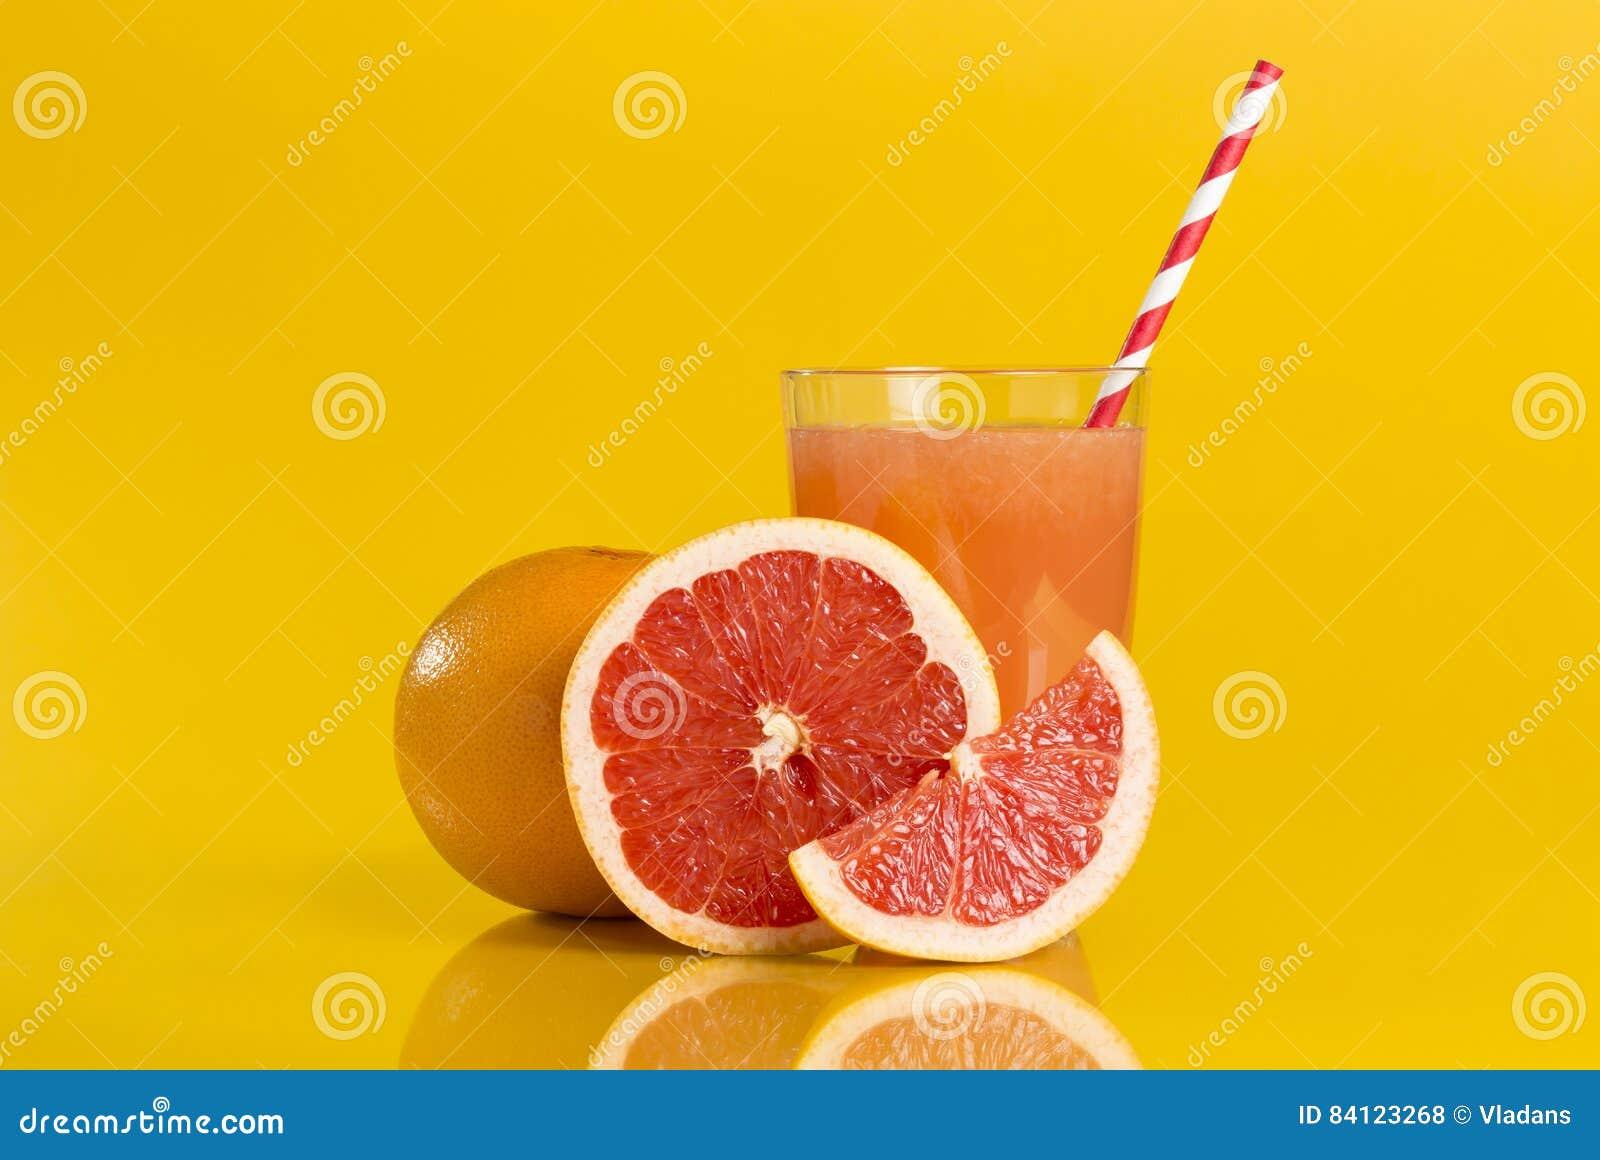 Sappige grapefruit